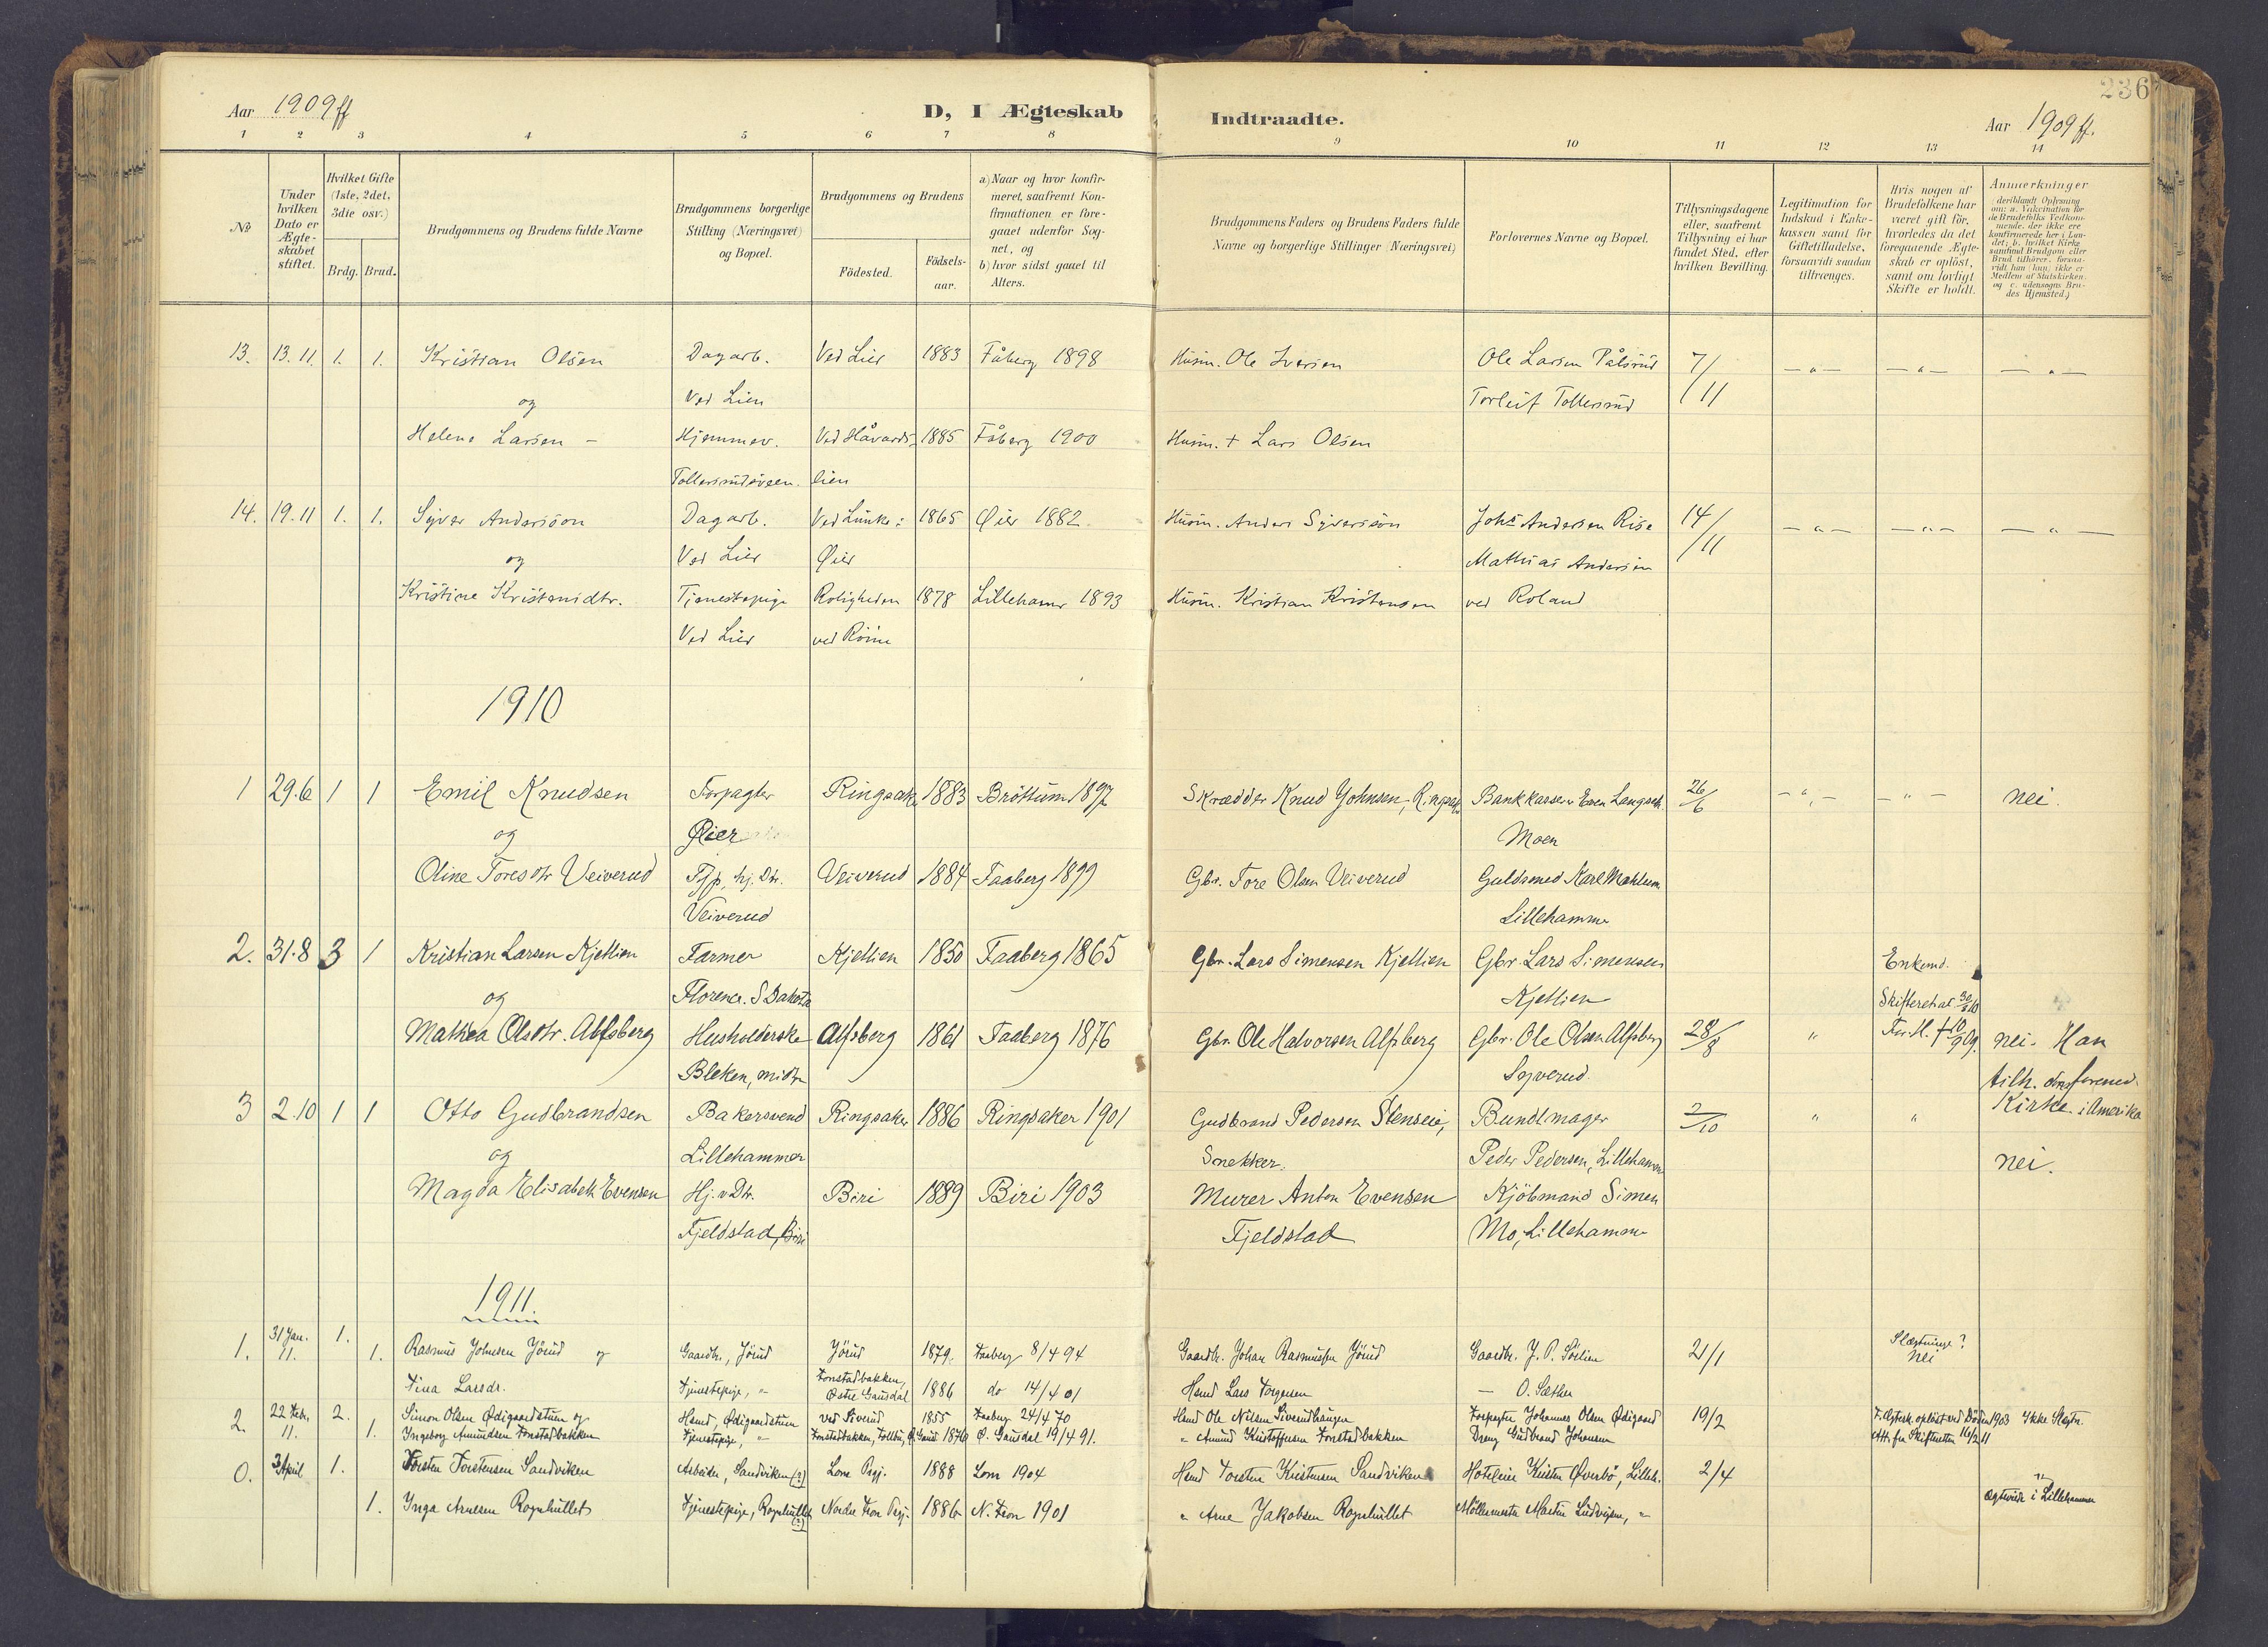 SAH, Fåberg prestekontor, Ministerialbok nr. 12, 1899-1915, s. 236